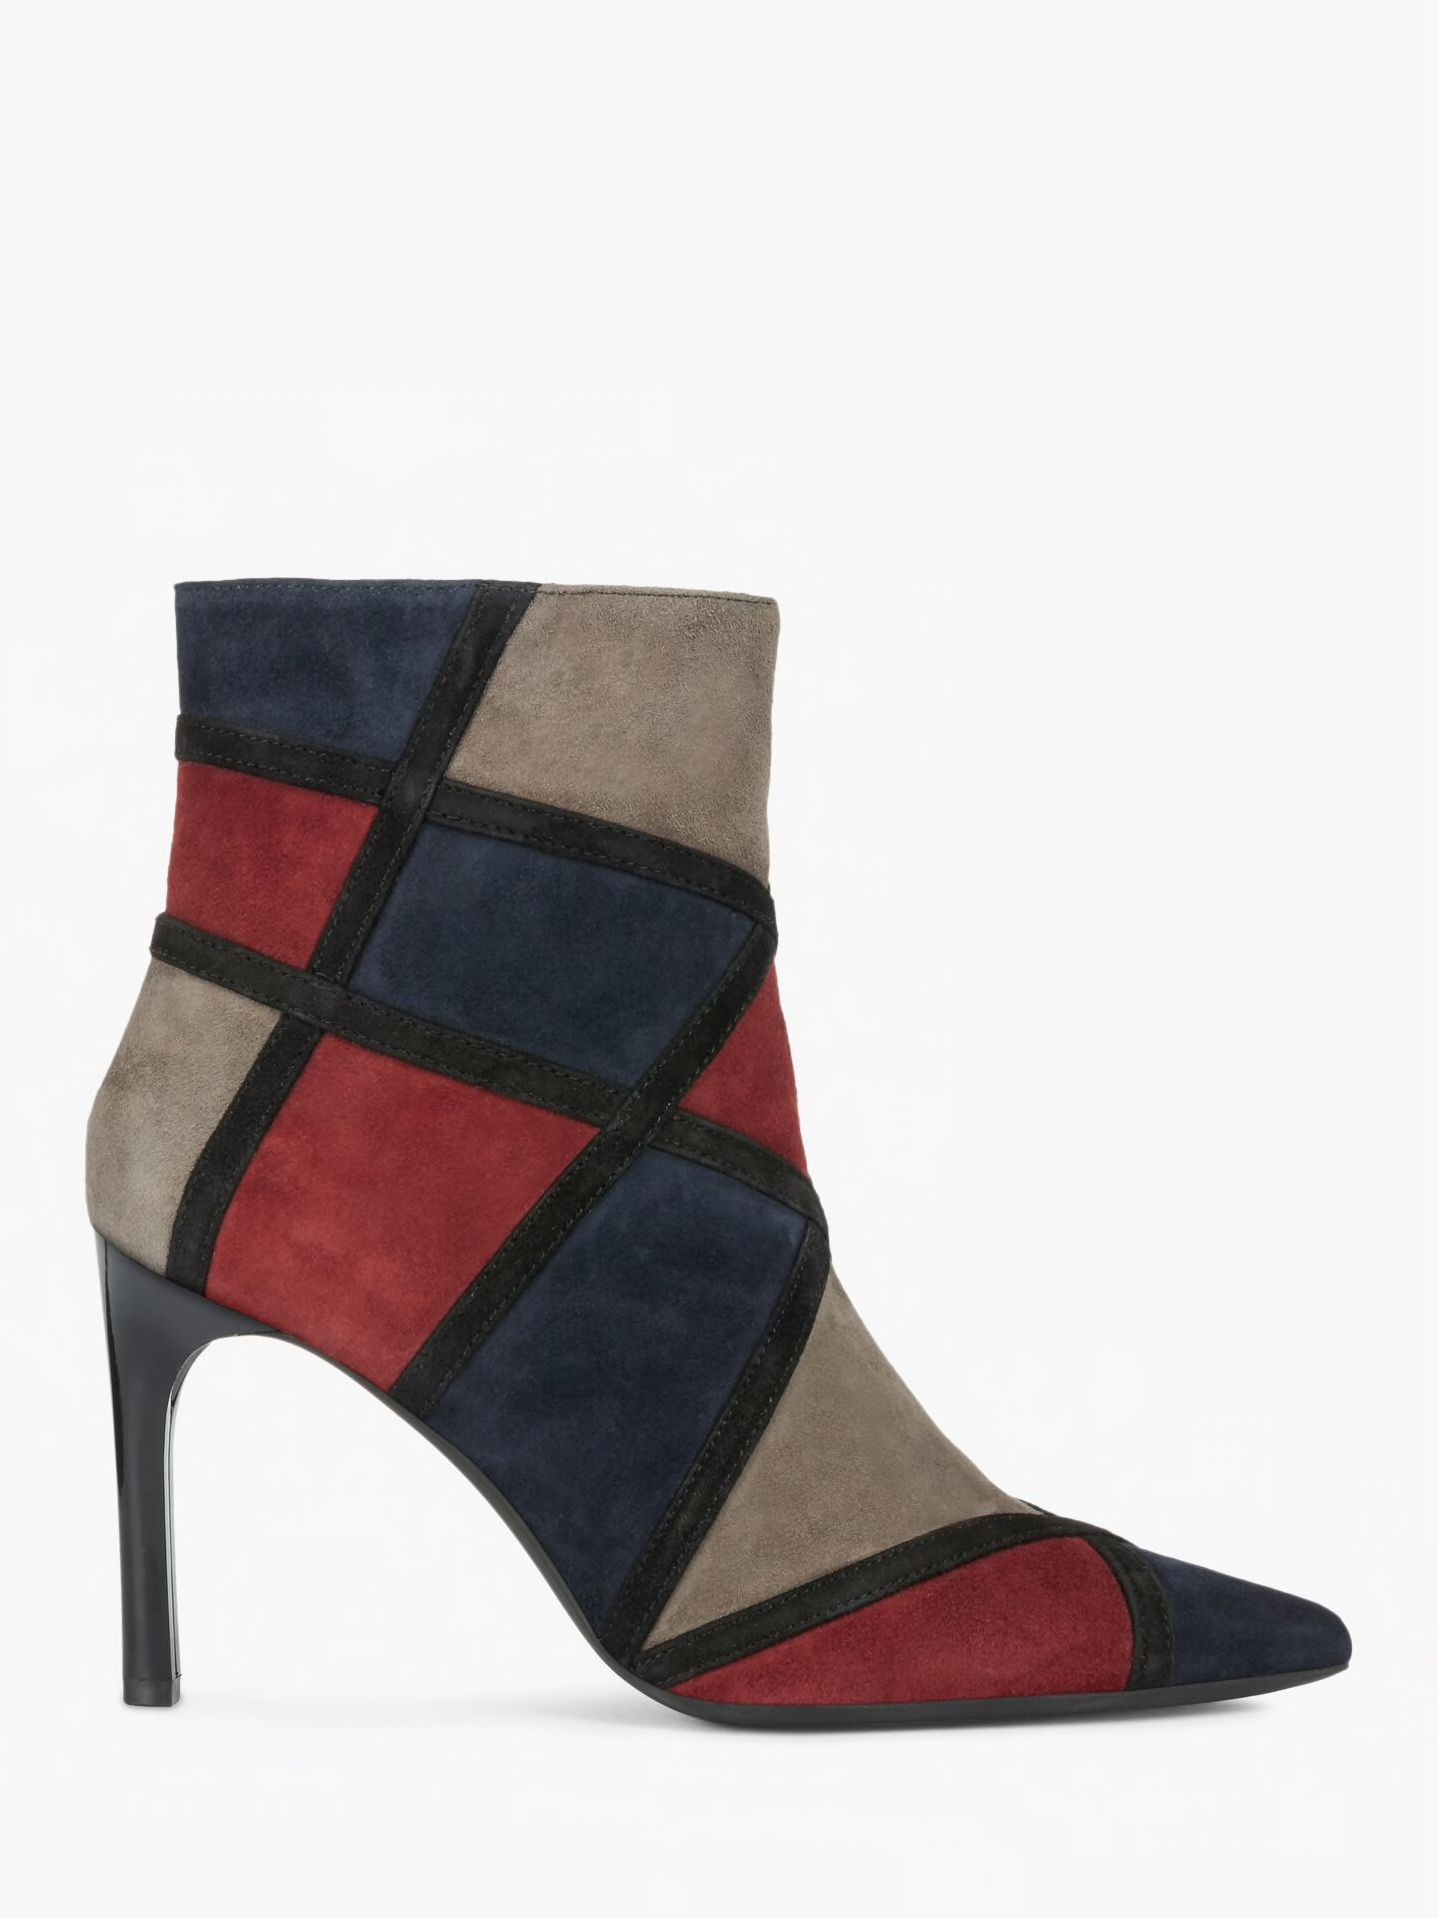 Geox Women's Faviola Suede Ankle Boots, BlueFuchsia | Suede